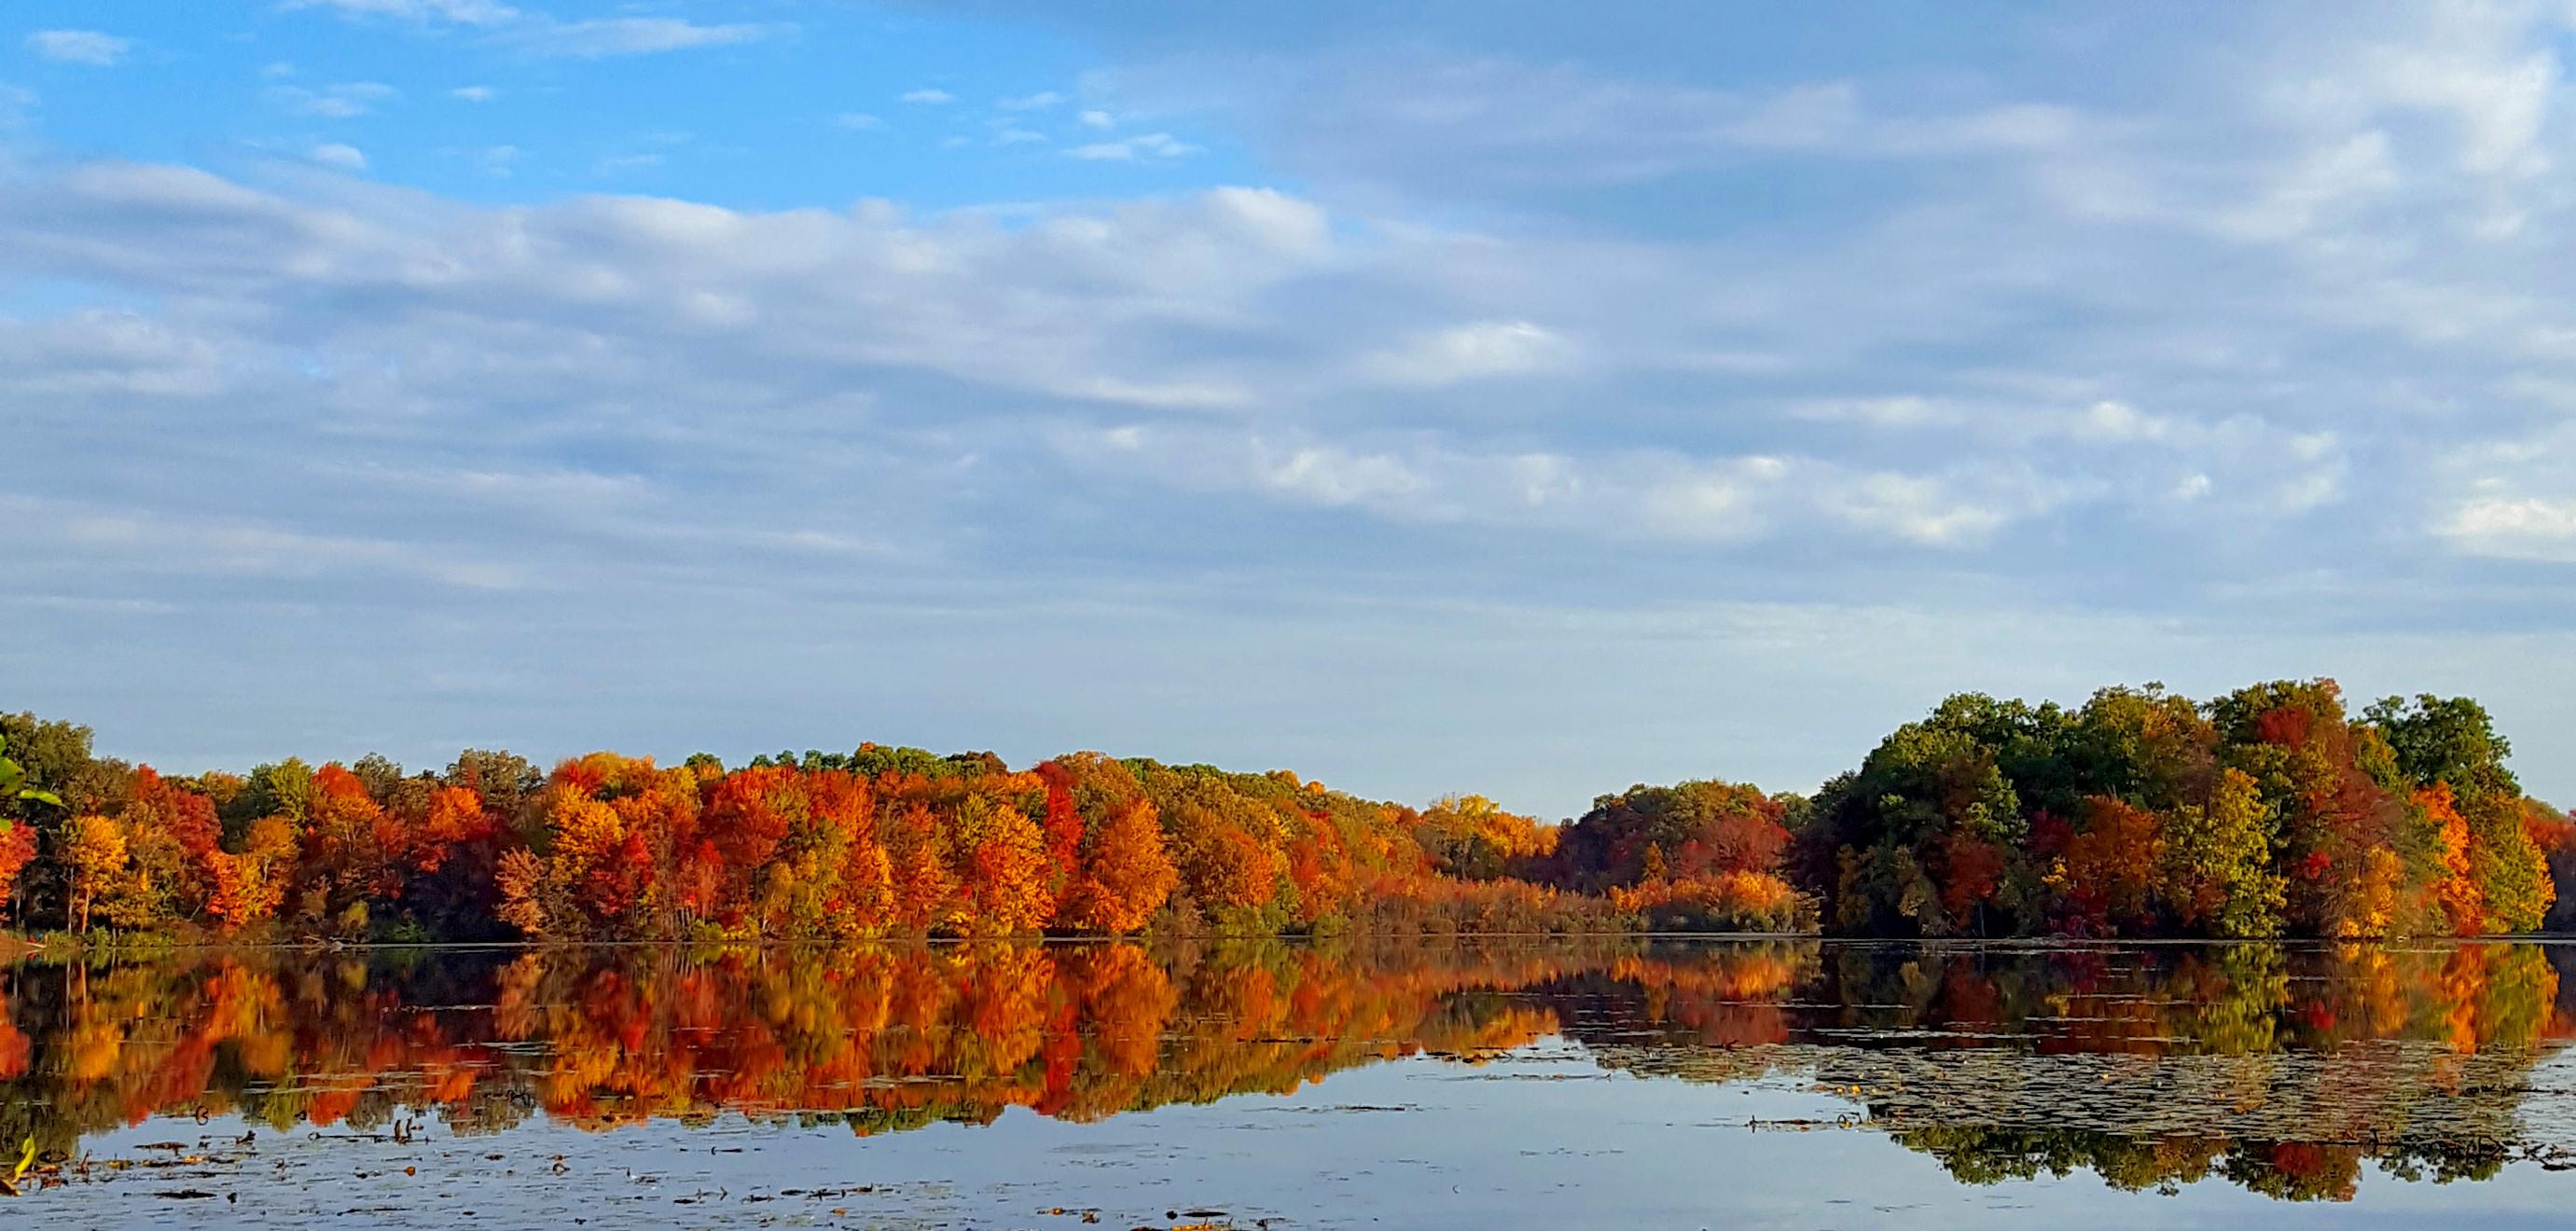 reservoir-taken-10-19-2016-landscape